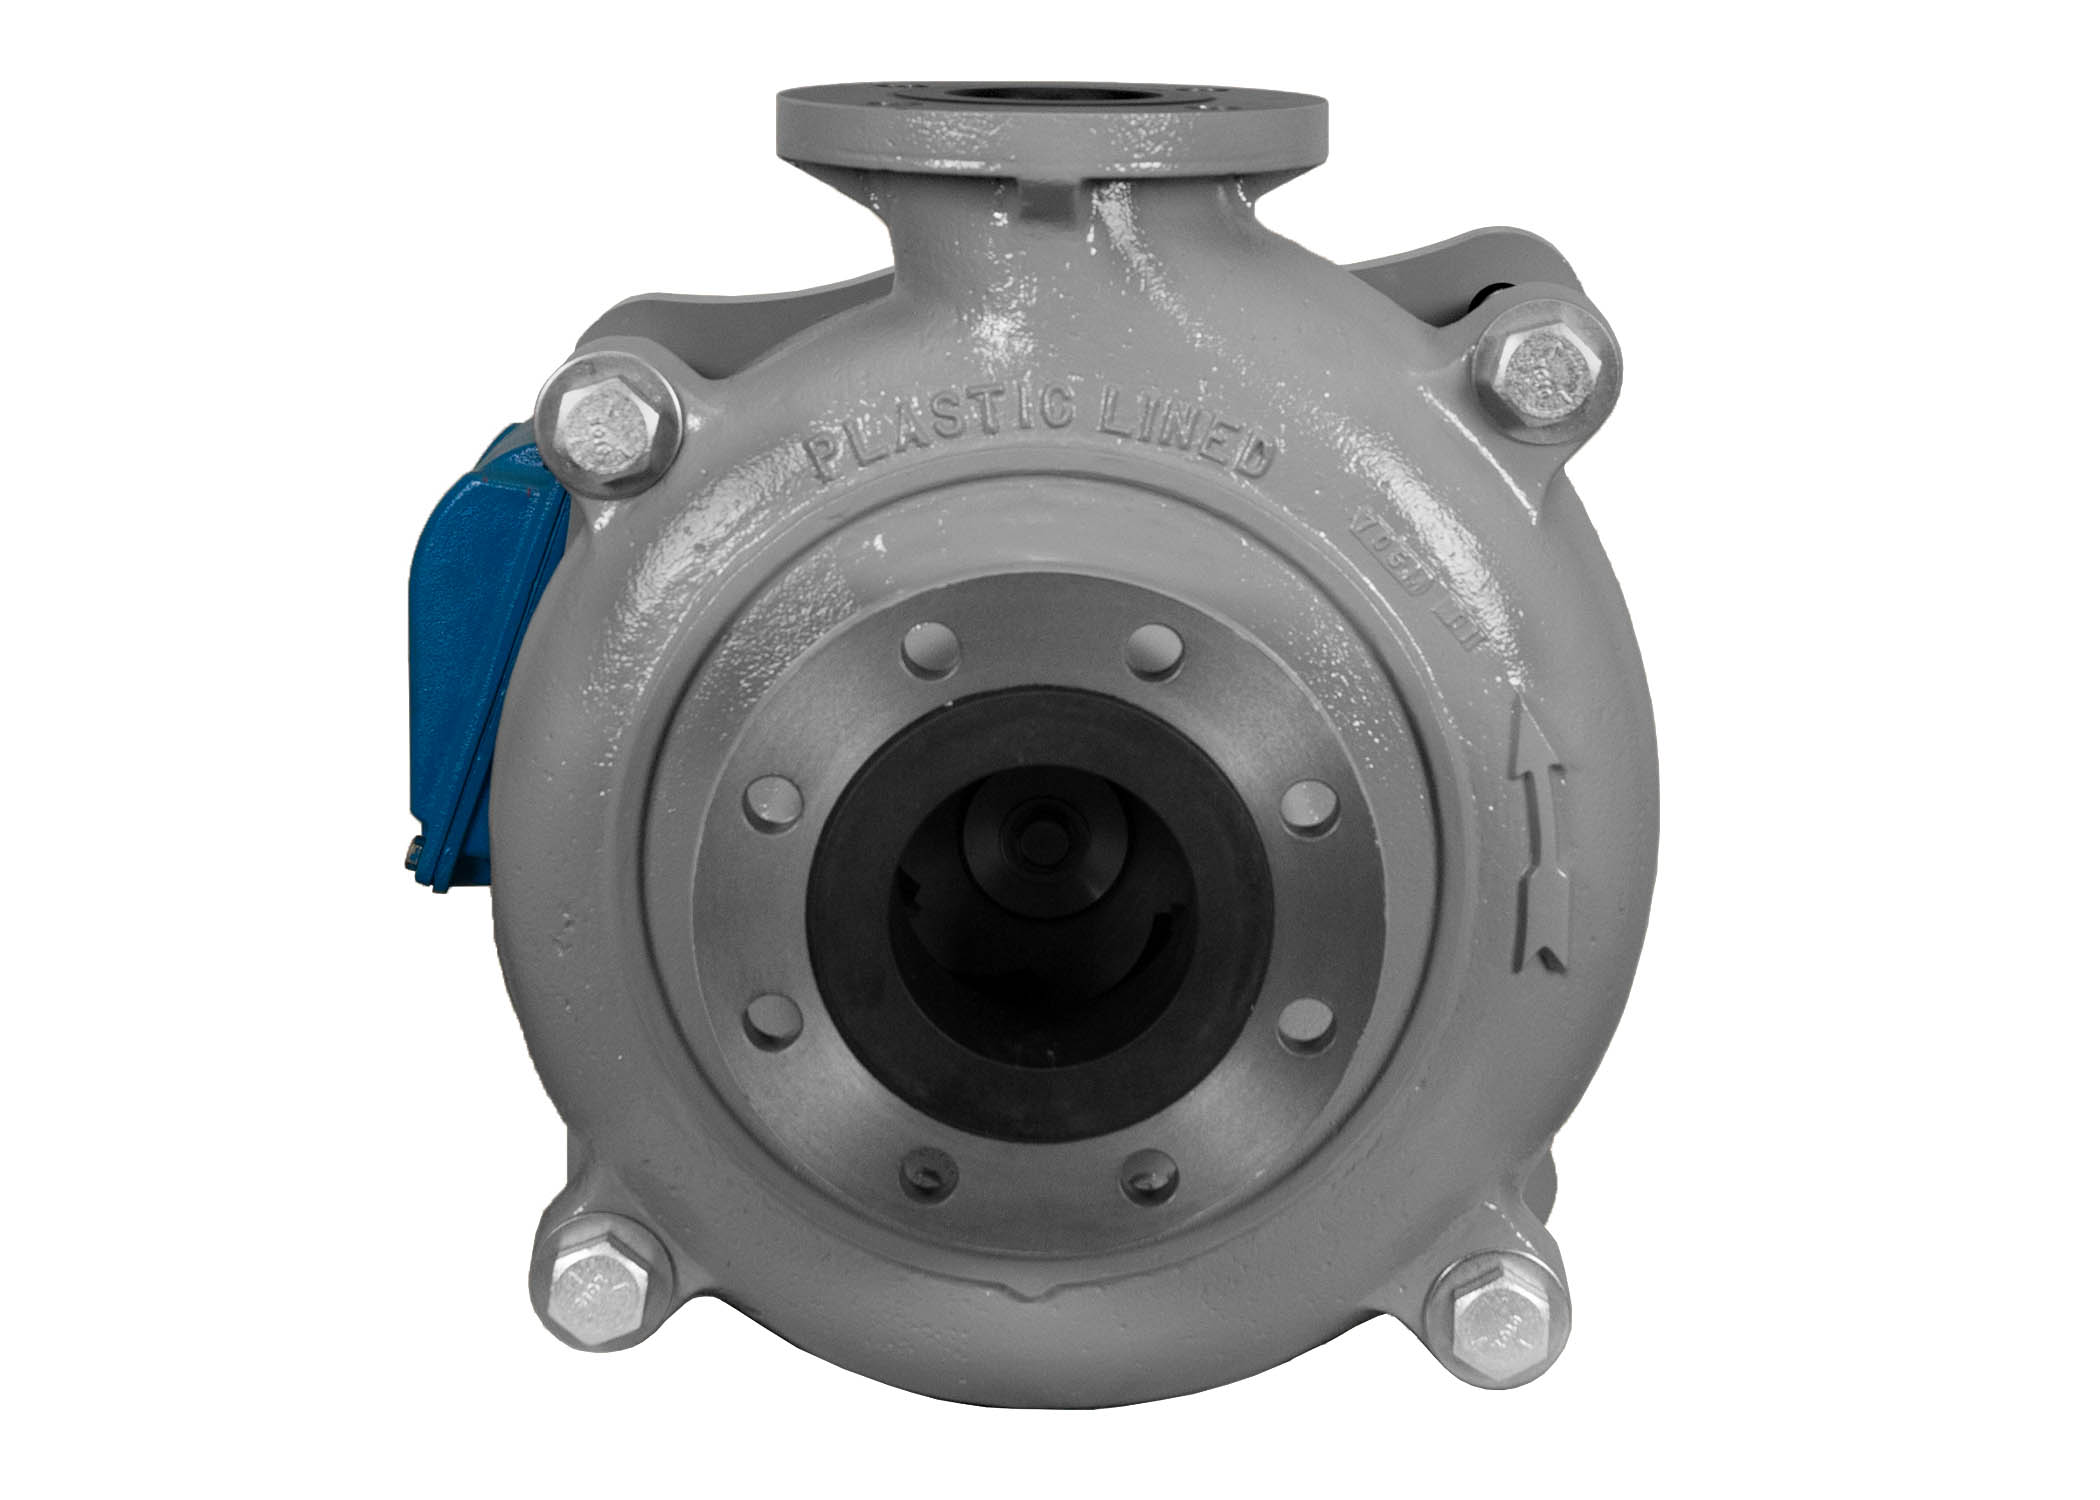 C-Shell 4x3-10 Pump with blue WEG Motor front view